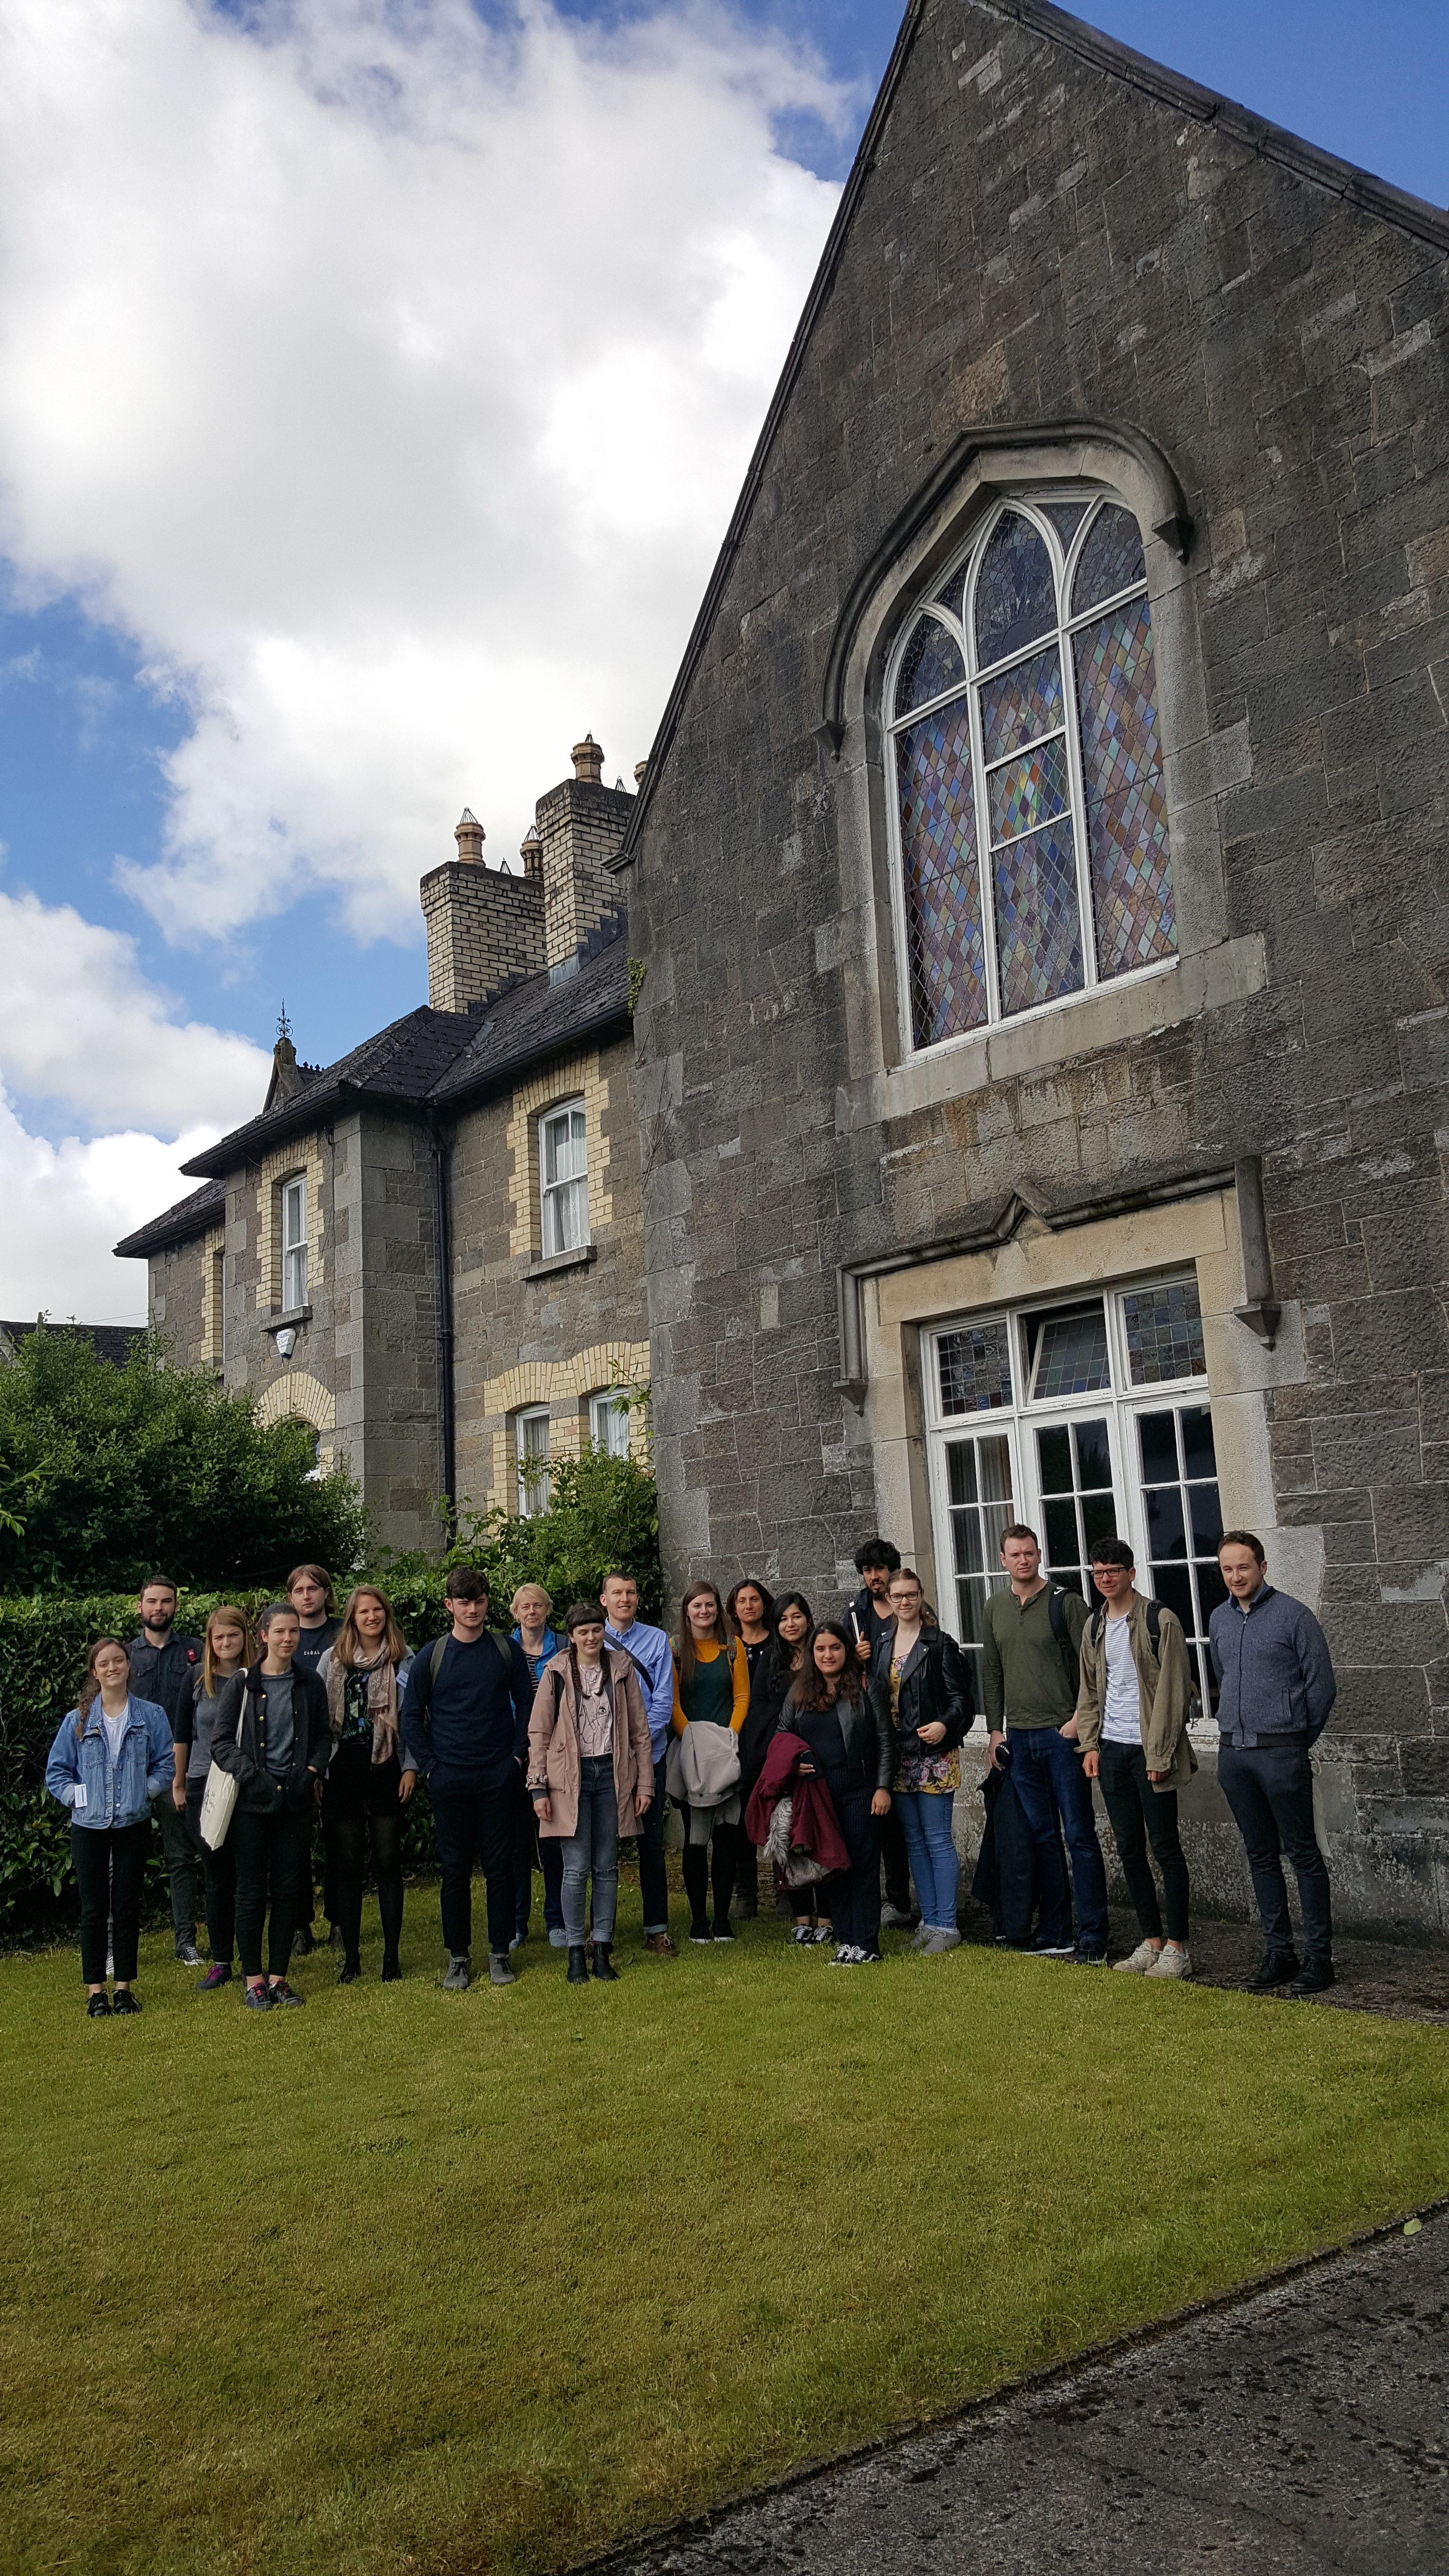 Students-gathered-outside-Mason-Hall-Co-Cavan.jpg#asset:12370